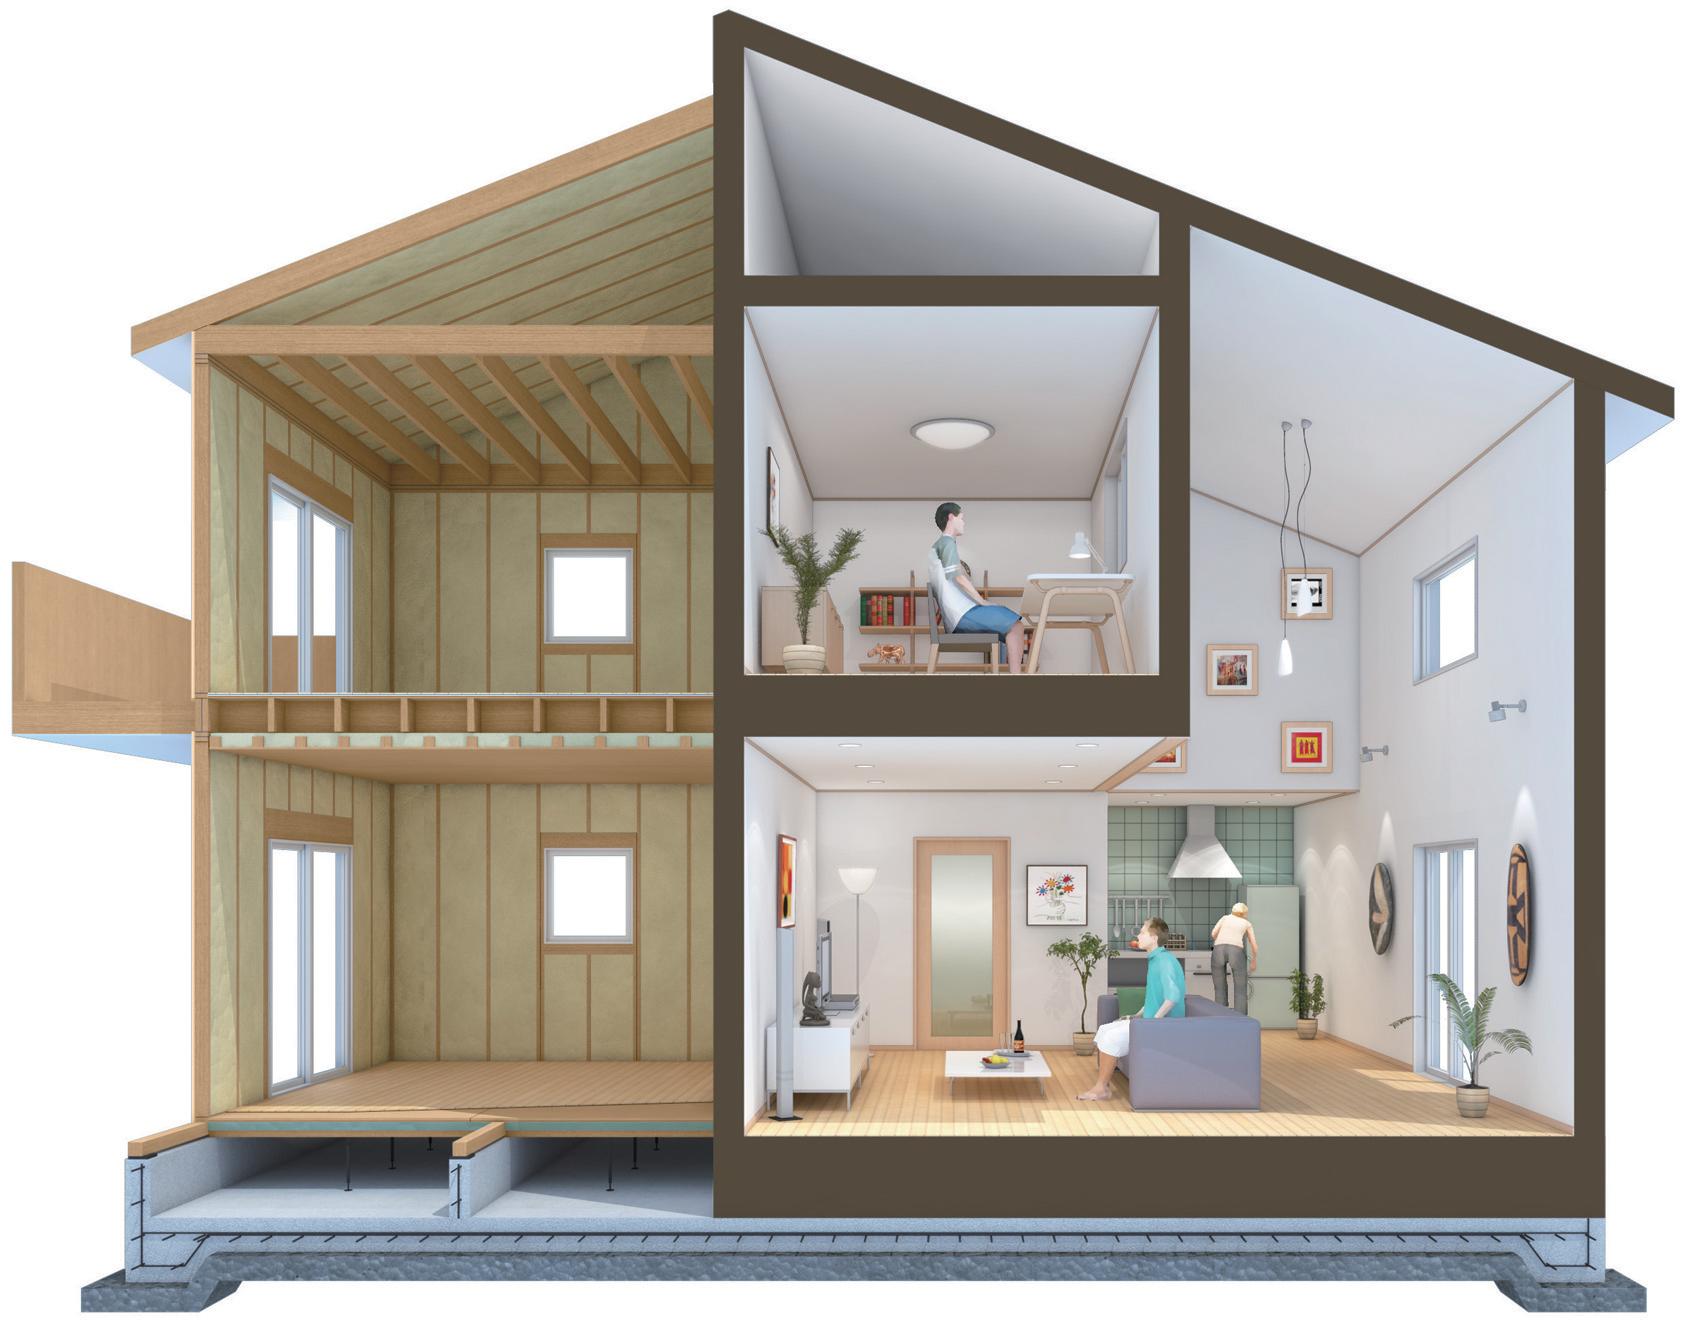 高気密高断熱性能の家の断面図